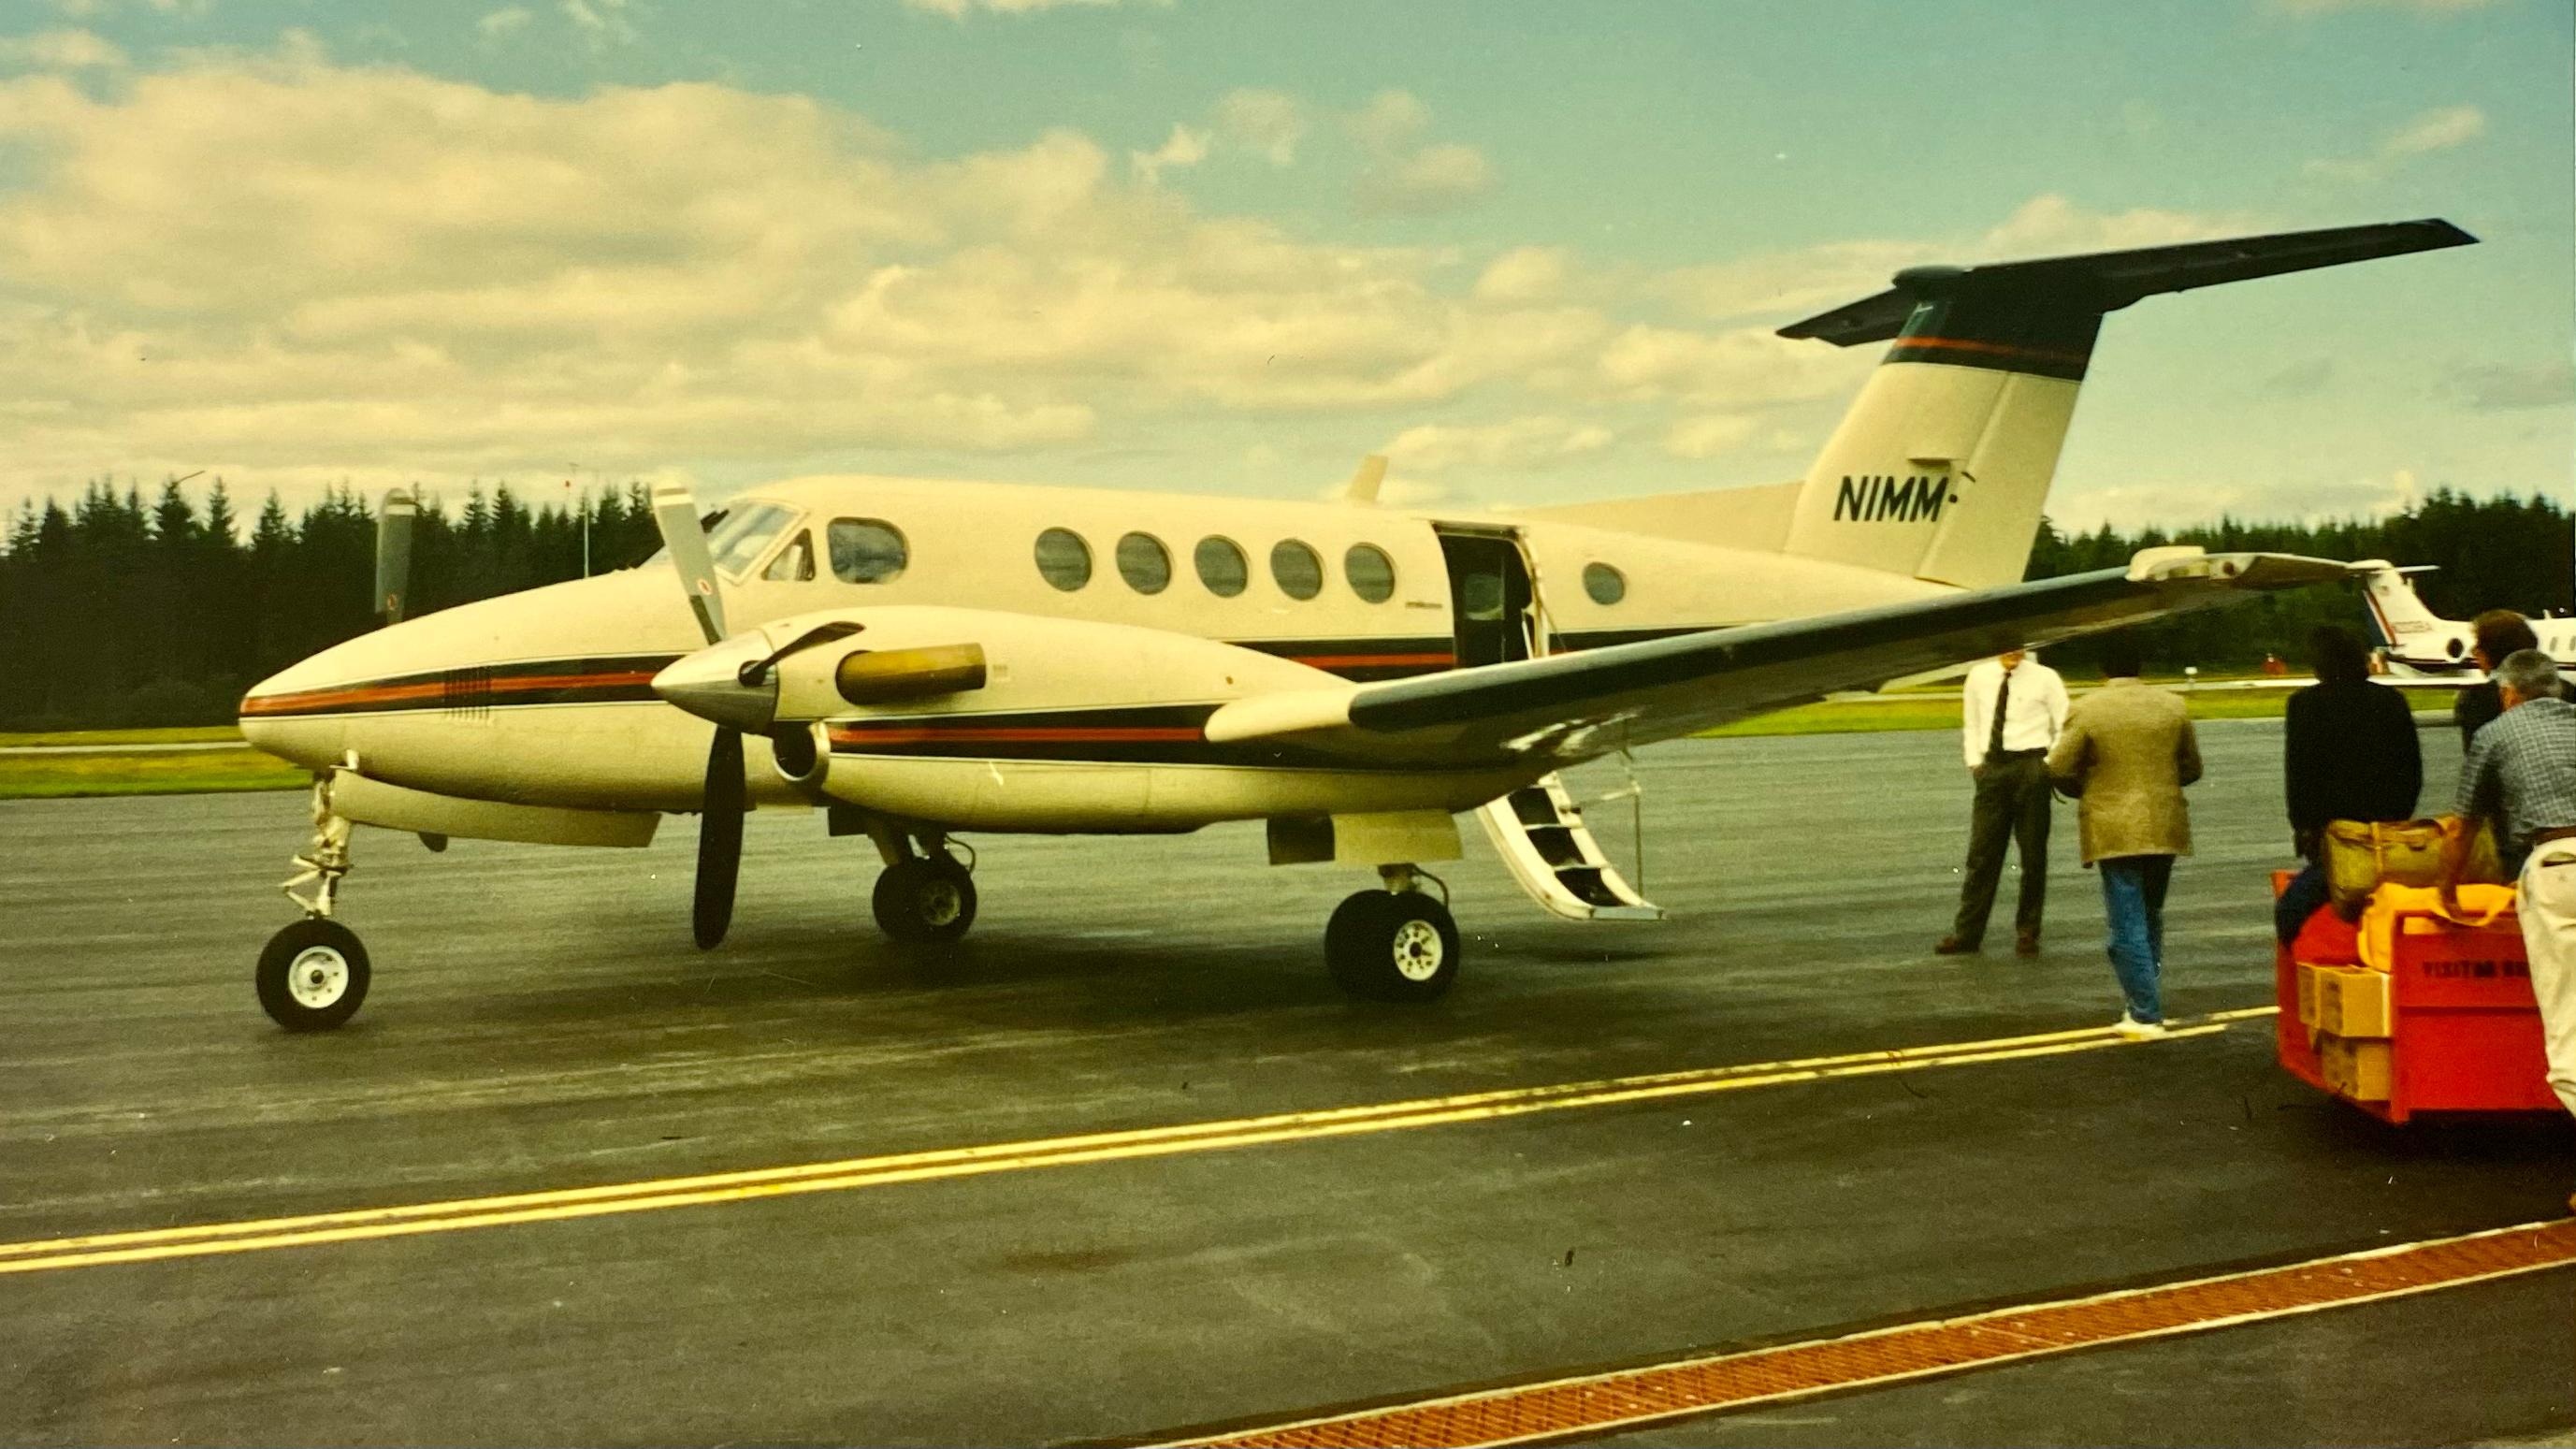 Michael Malone - N1MM King Air